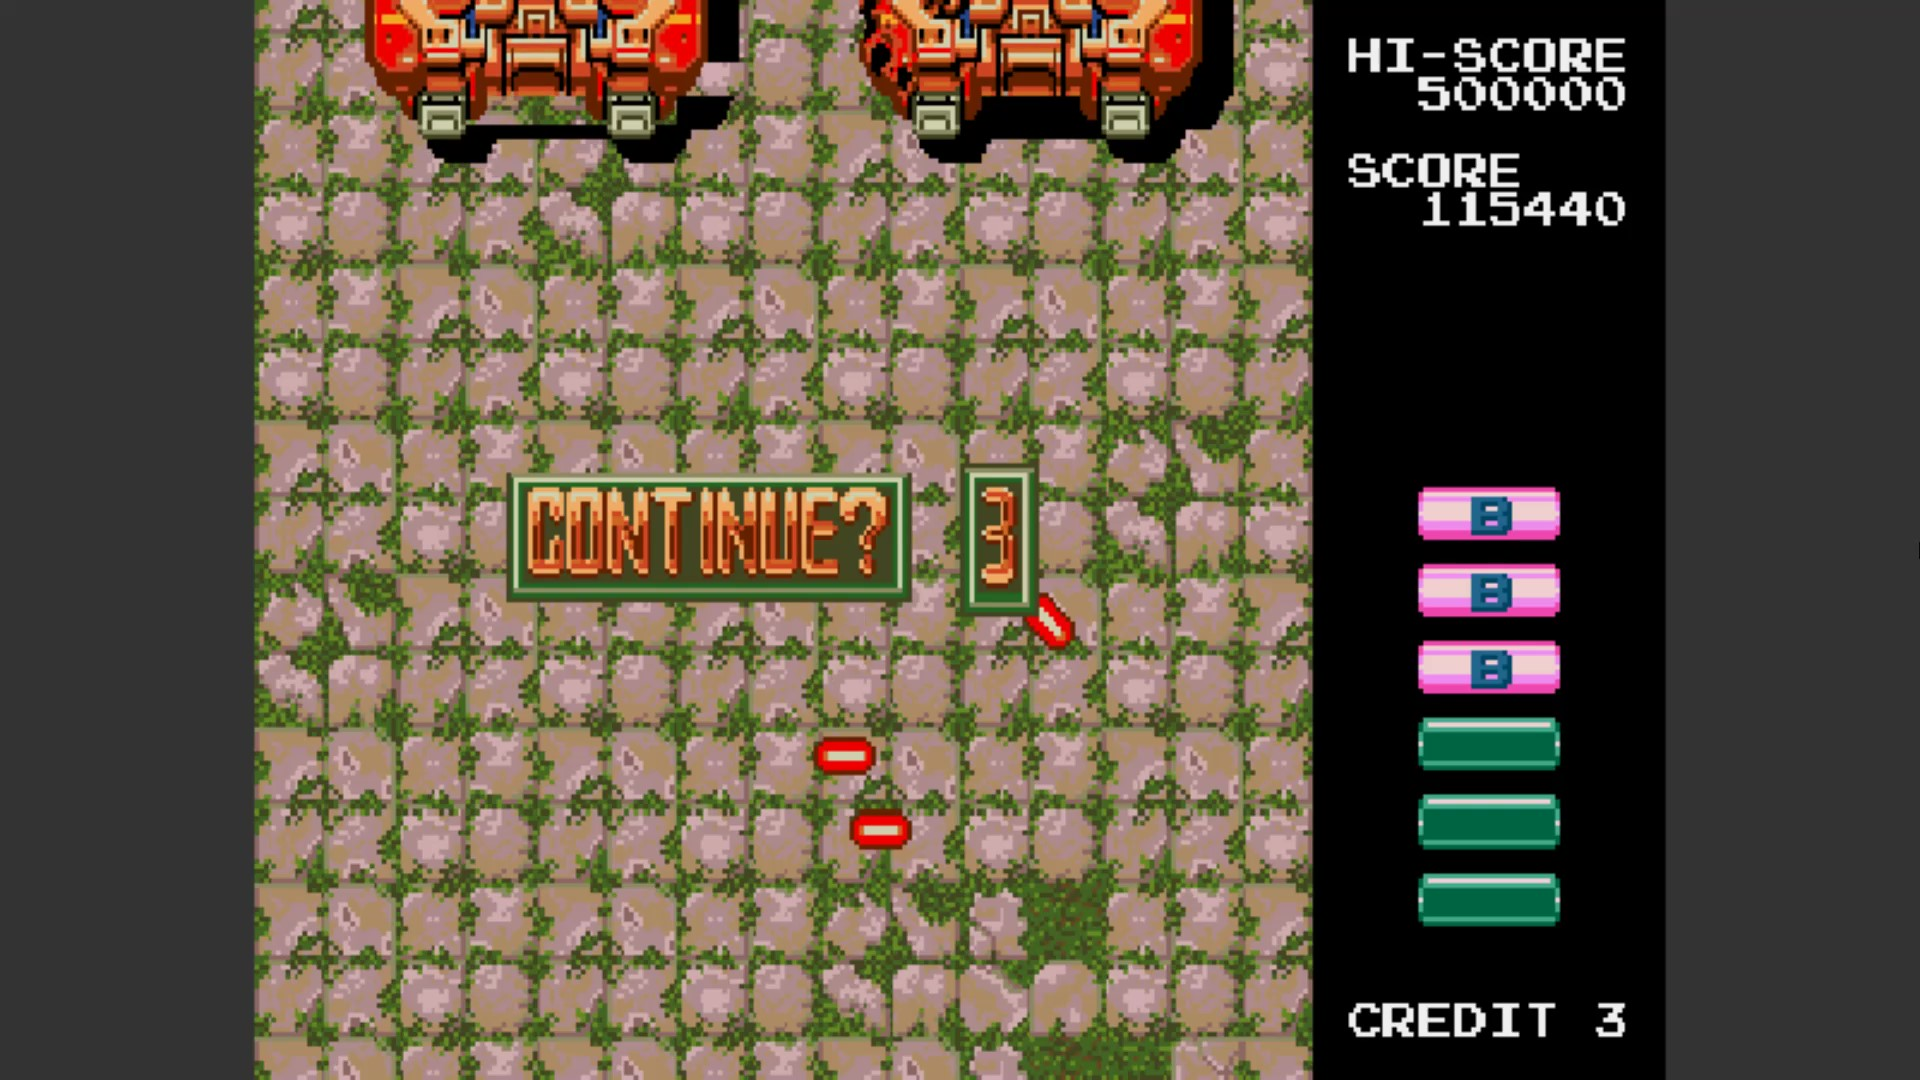 AkinNahtanoj: Grind Stormer [Moderate] (Sega Genesis / MegaDrive Emulated) 115,440 points on 2020-10-31 04:33:27